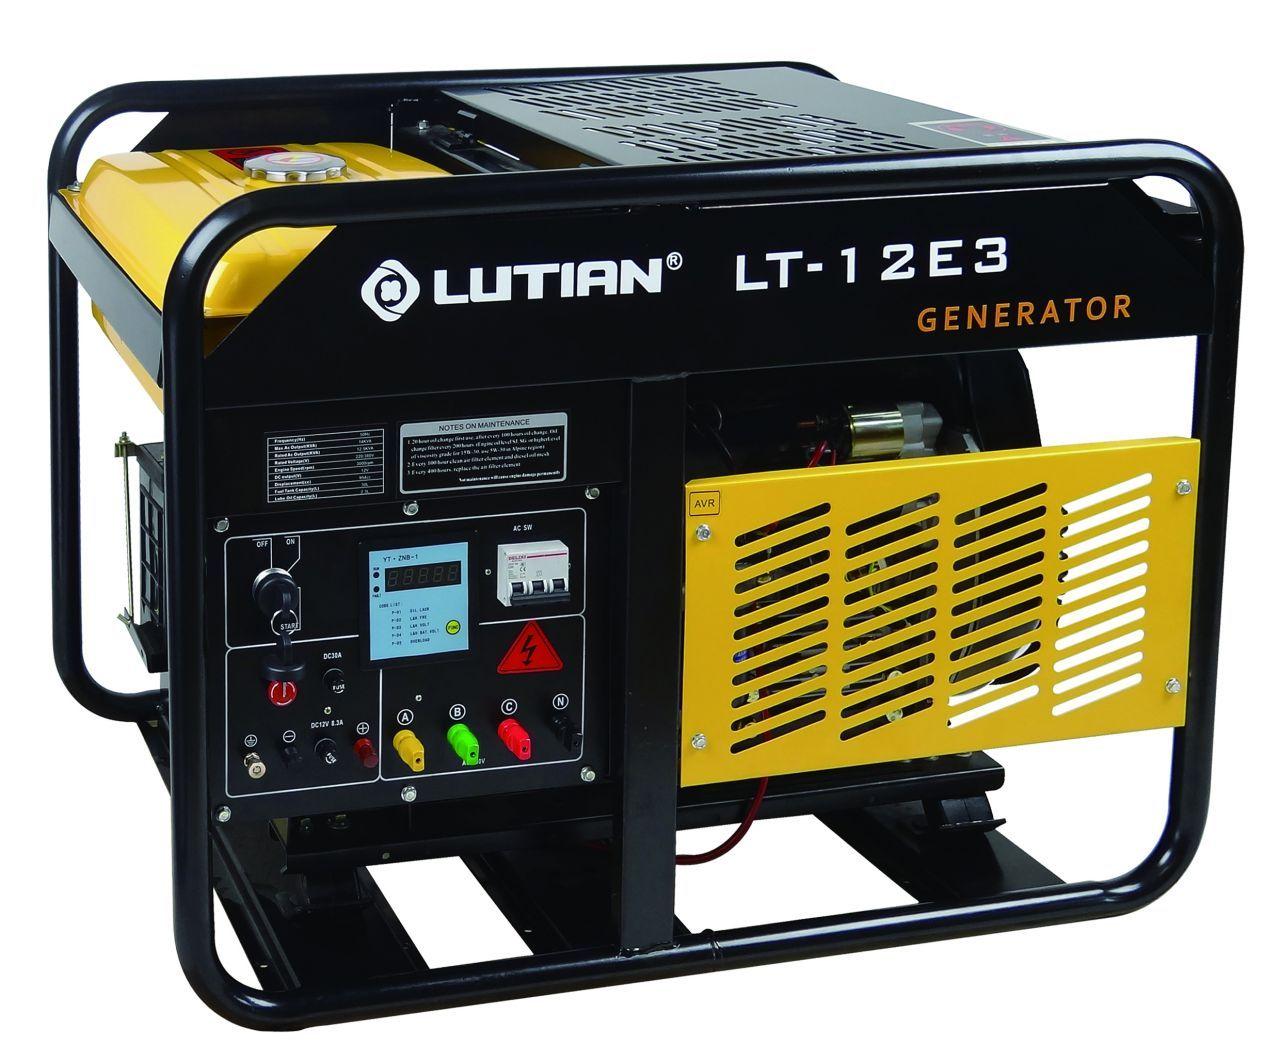 Lutian Lt12e Akulu Dizel Jenerator 220v 10kva Agirliklar